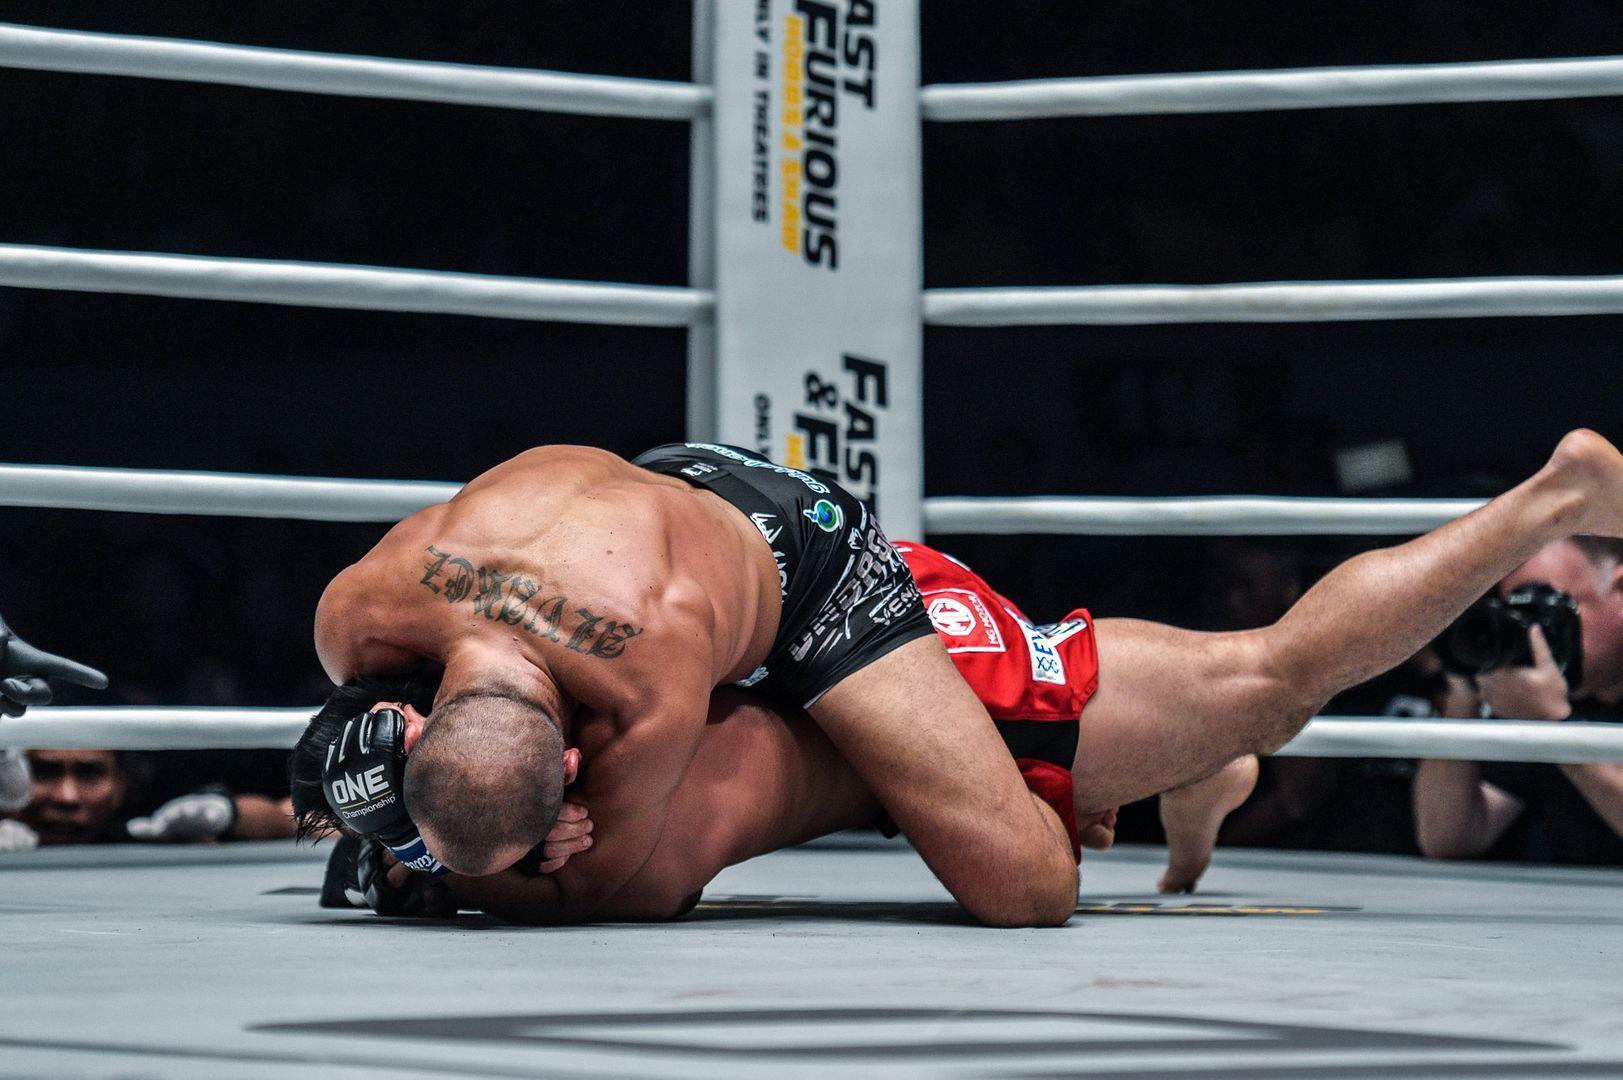 Eddie Alvarez locks up the rear-naked choke on Eduard Folayang